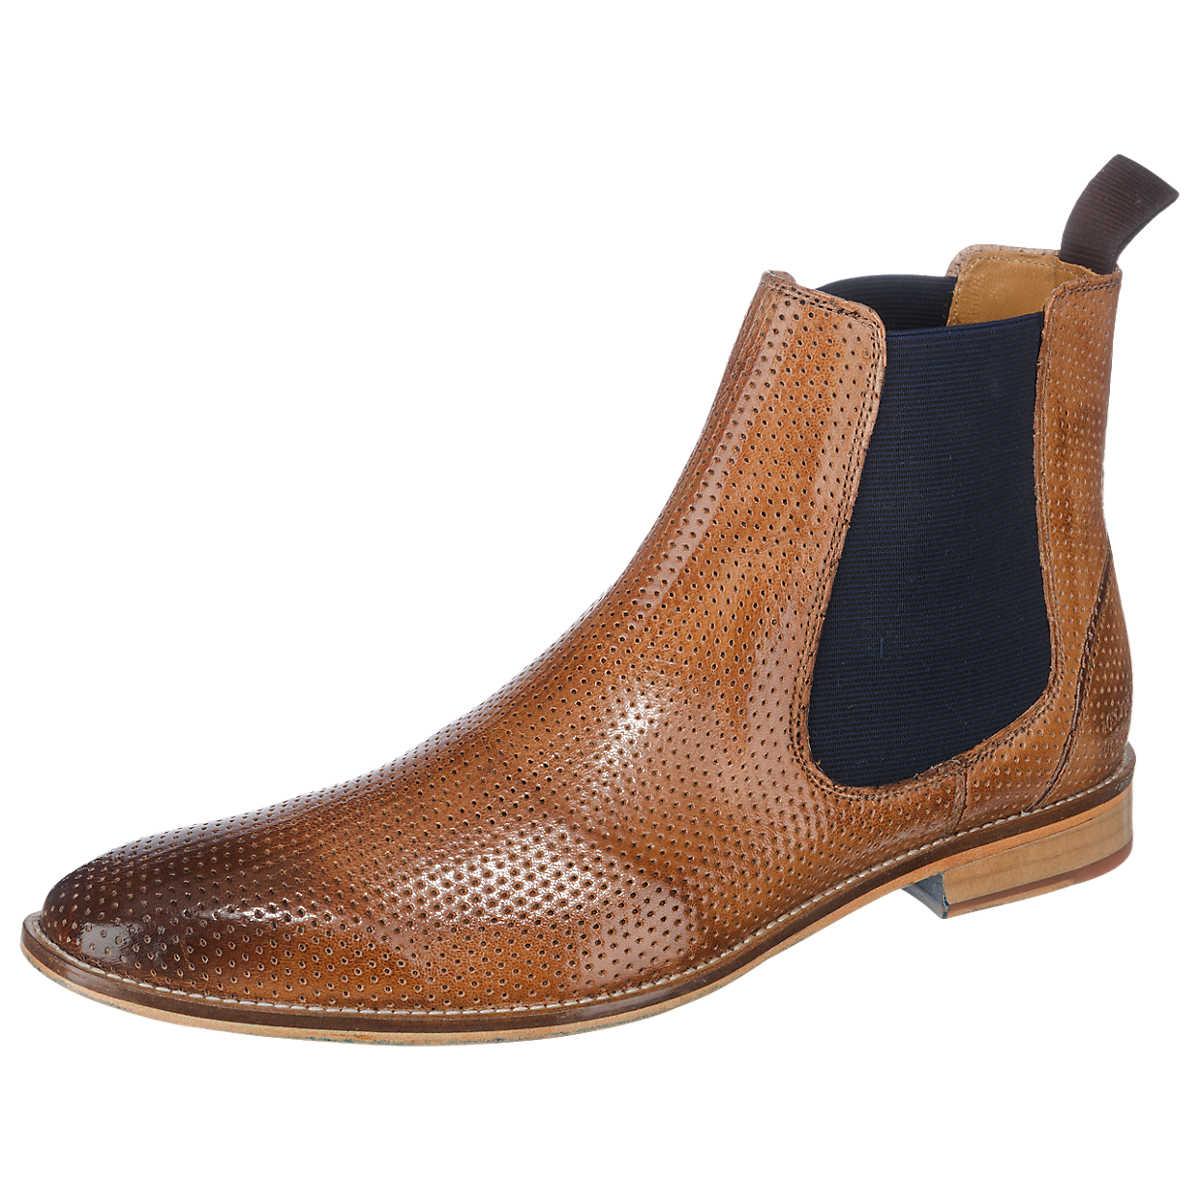 MELVIN & HAMILTON Martin 6 Stiefel & Stiefeletten braun - MELVIN & HAMILTON - Stiefeletten - Schuhe - mirapodo.de